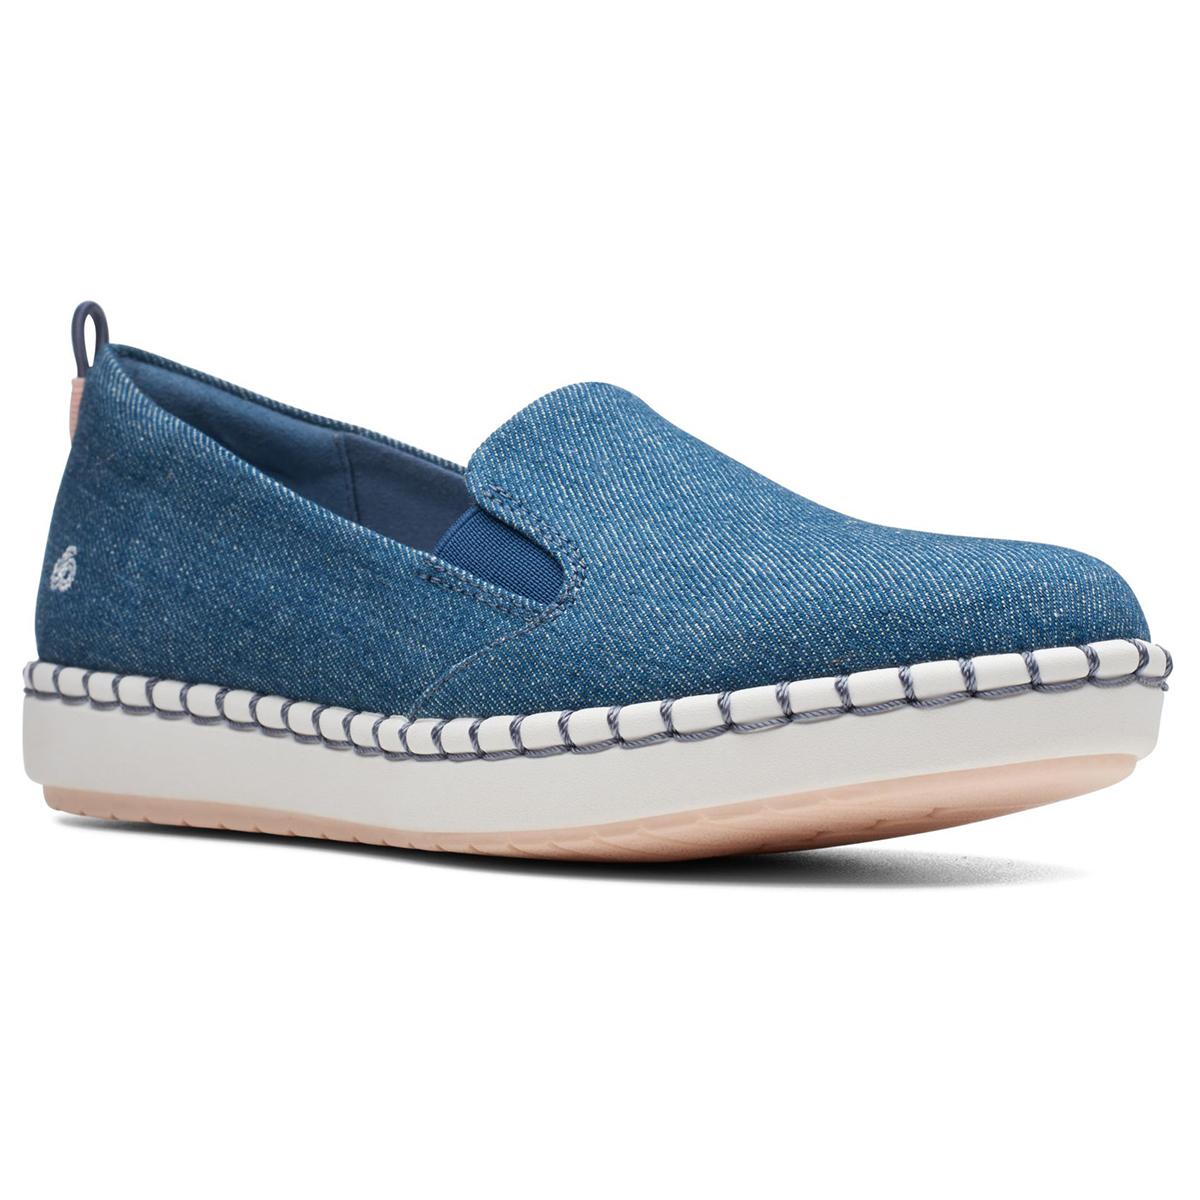 Clarks Women's Cloudstepper Step Glow Slip-On Shoes - Blue, 6